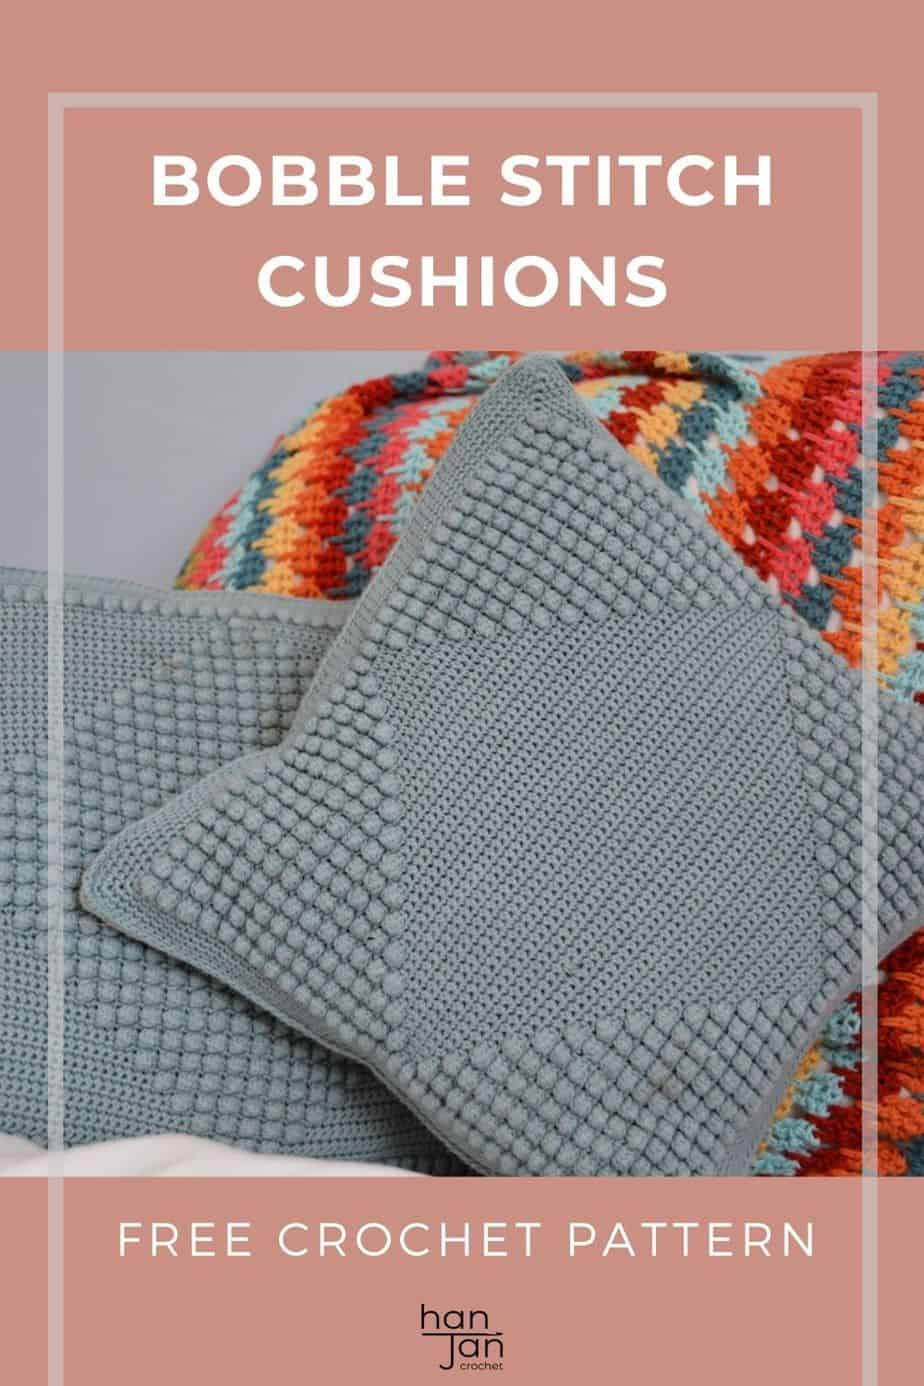 pin showing bobble stitch crochet cushion pattern, a modern home decor pattern